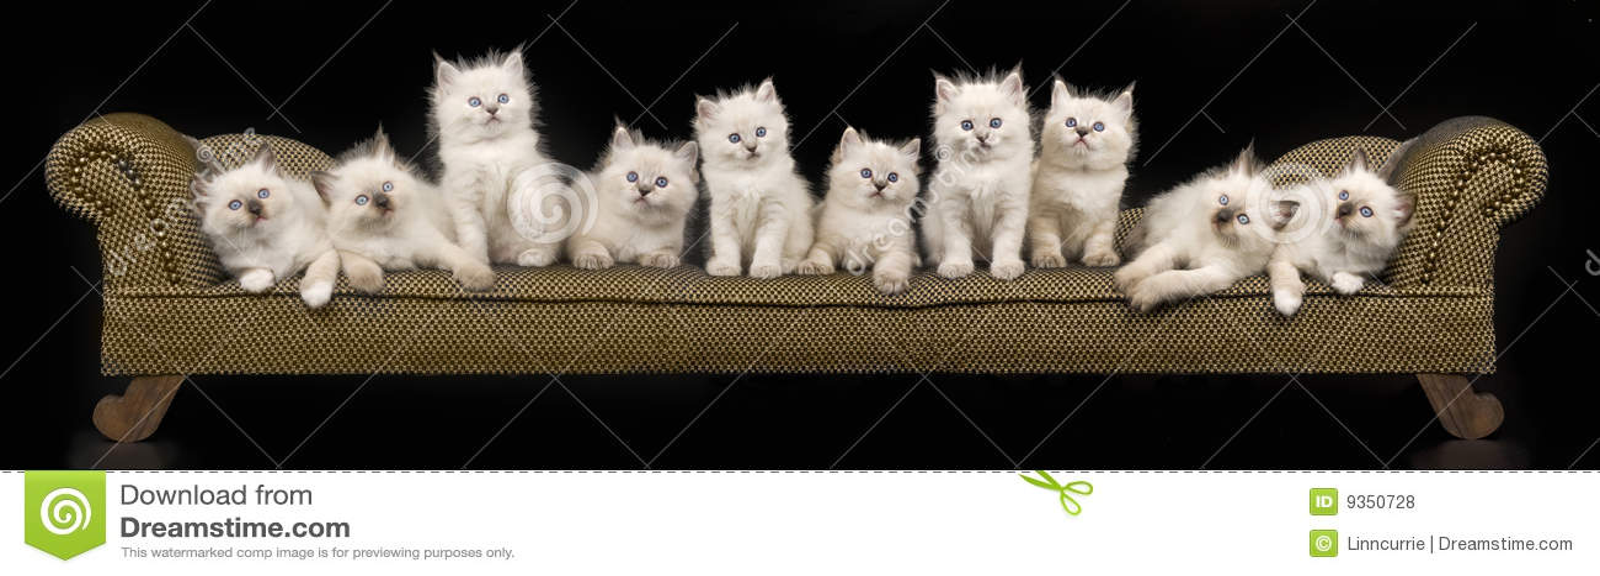 Donald Judd Untitled as well Nicole Ray 著名欧美AV女优排行榜中榜 天天排行网 besides Ragdoll Kitten moreover Bolt Clip Art in addition People In Middle Of Ocean. on 384 html